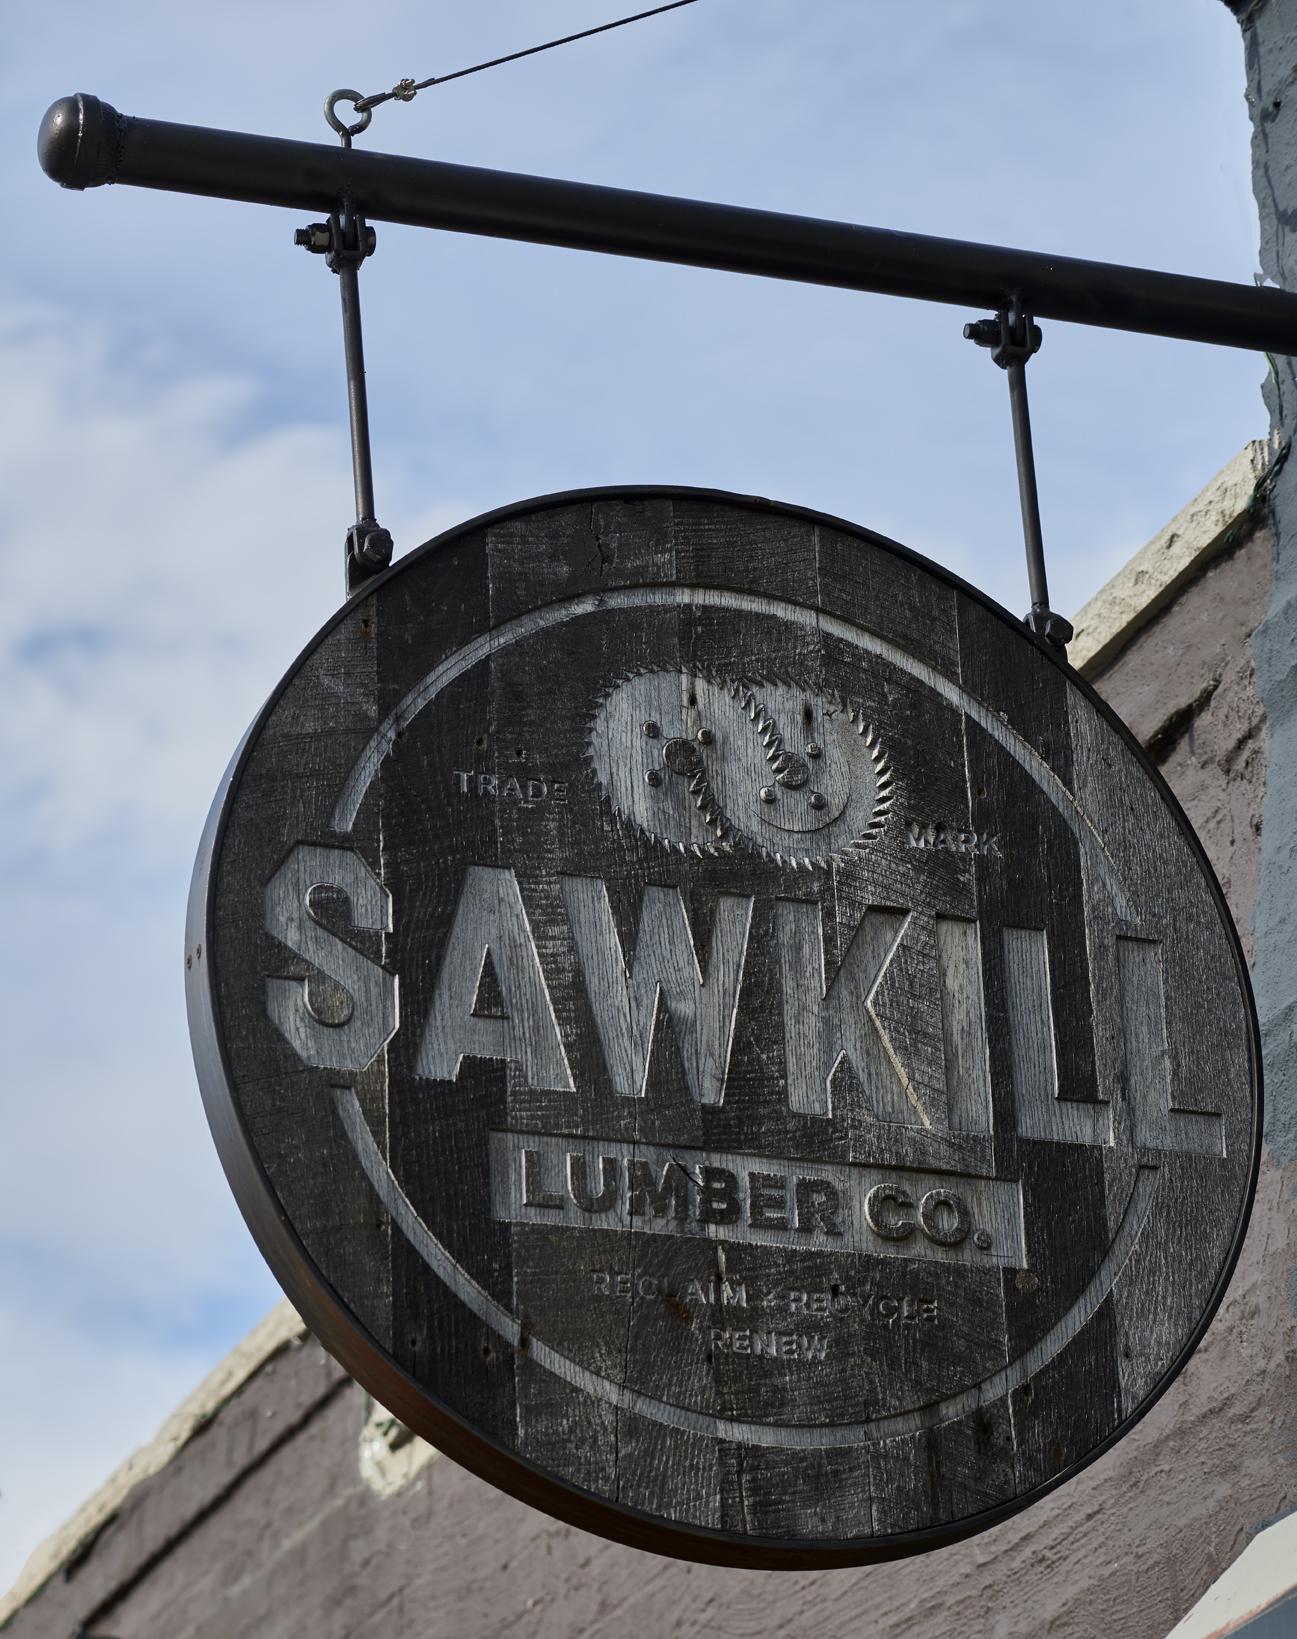 Sawkill panel